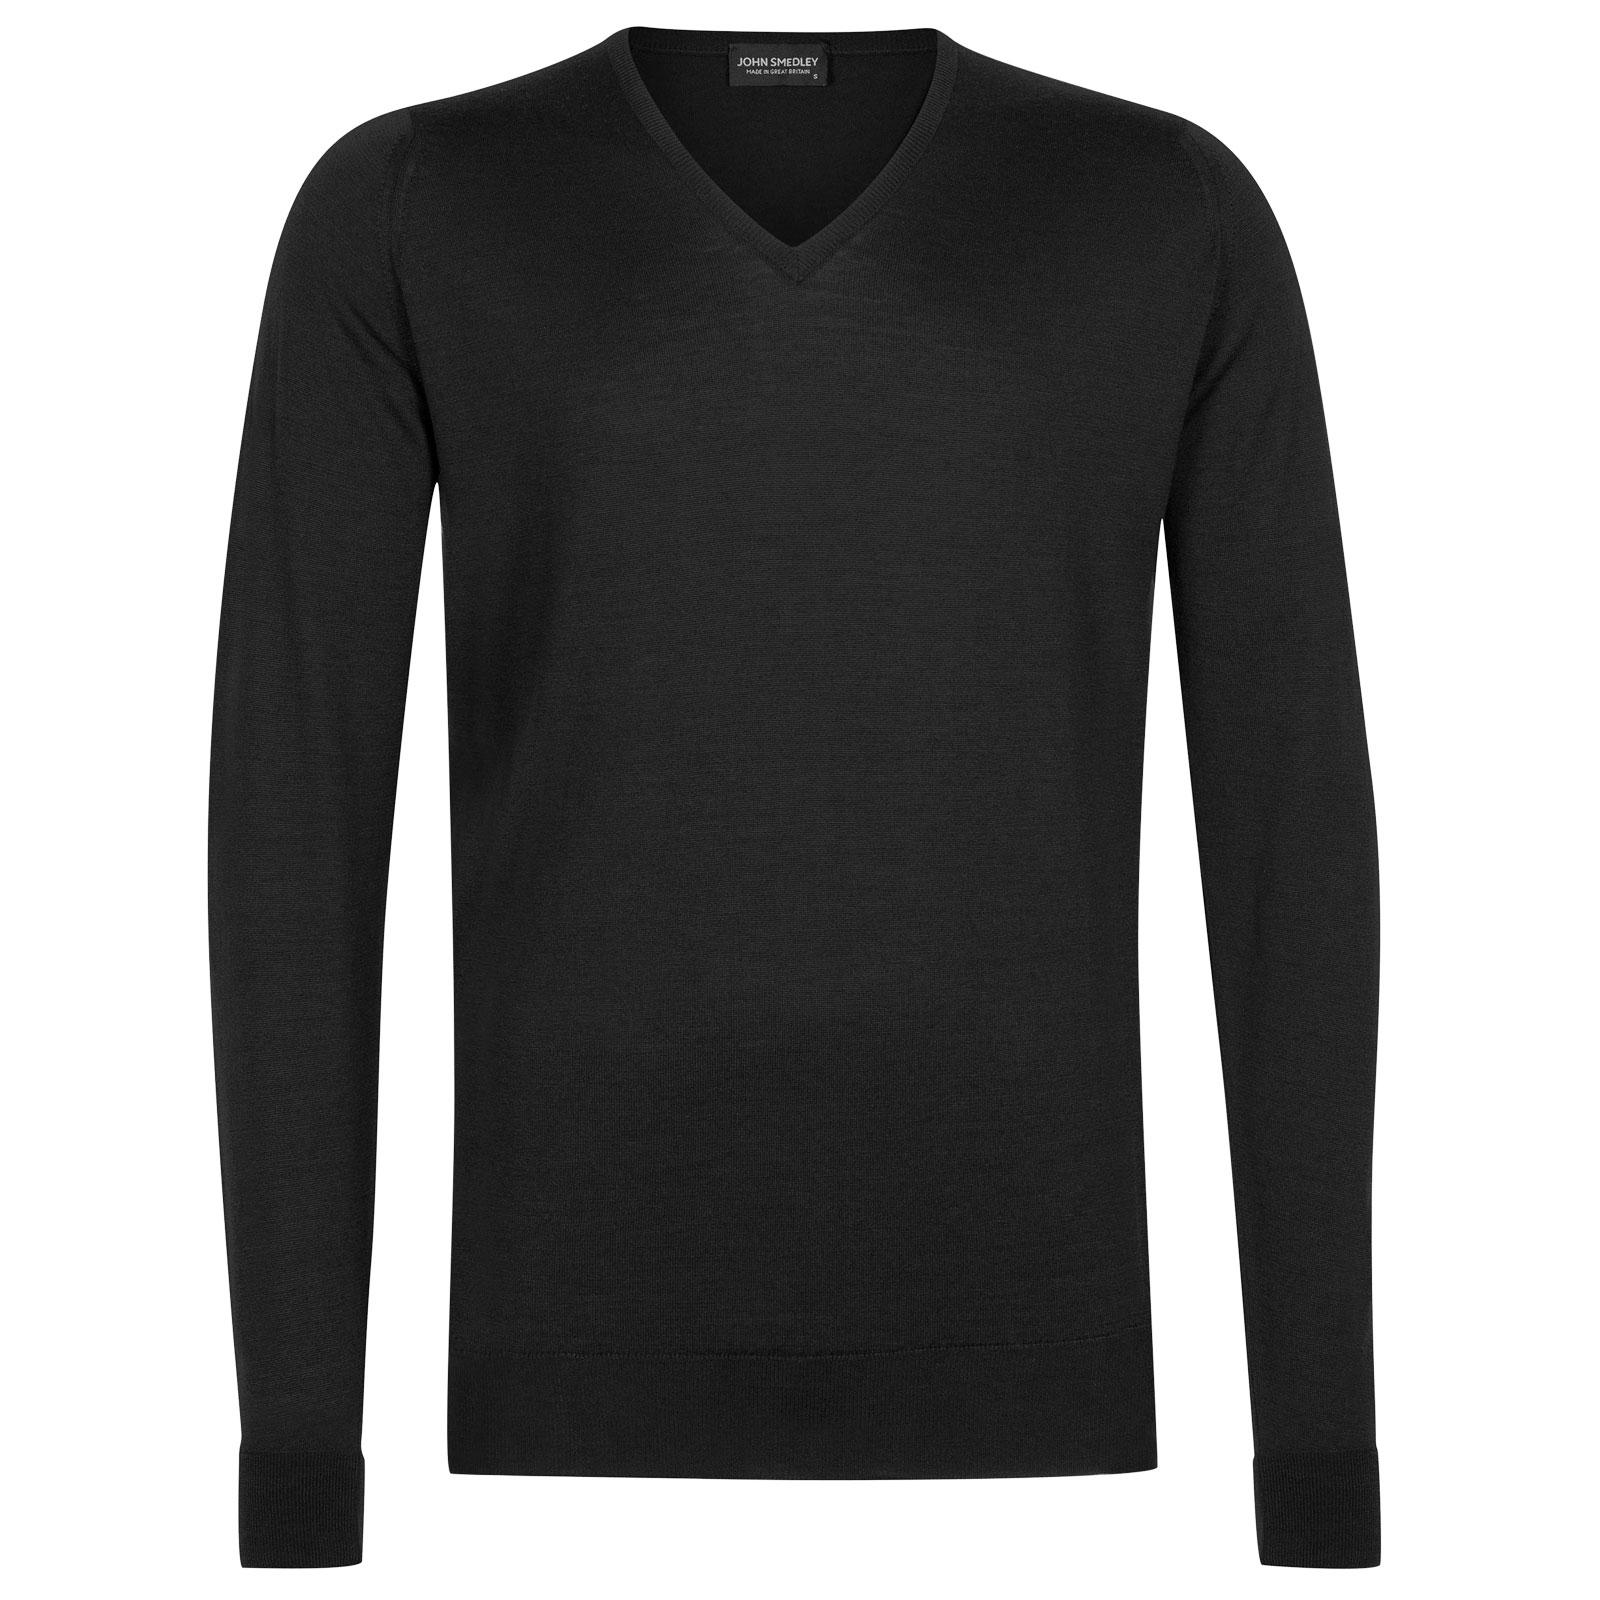 John Smedley Blenheim Merino Wool Pullover in Black-XXL